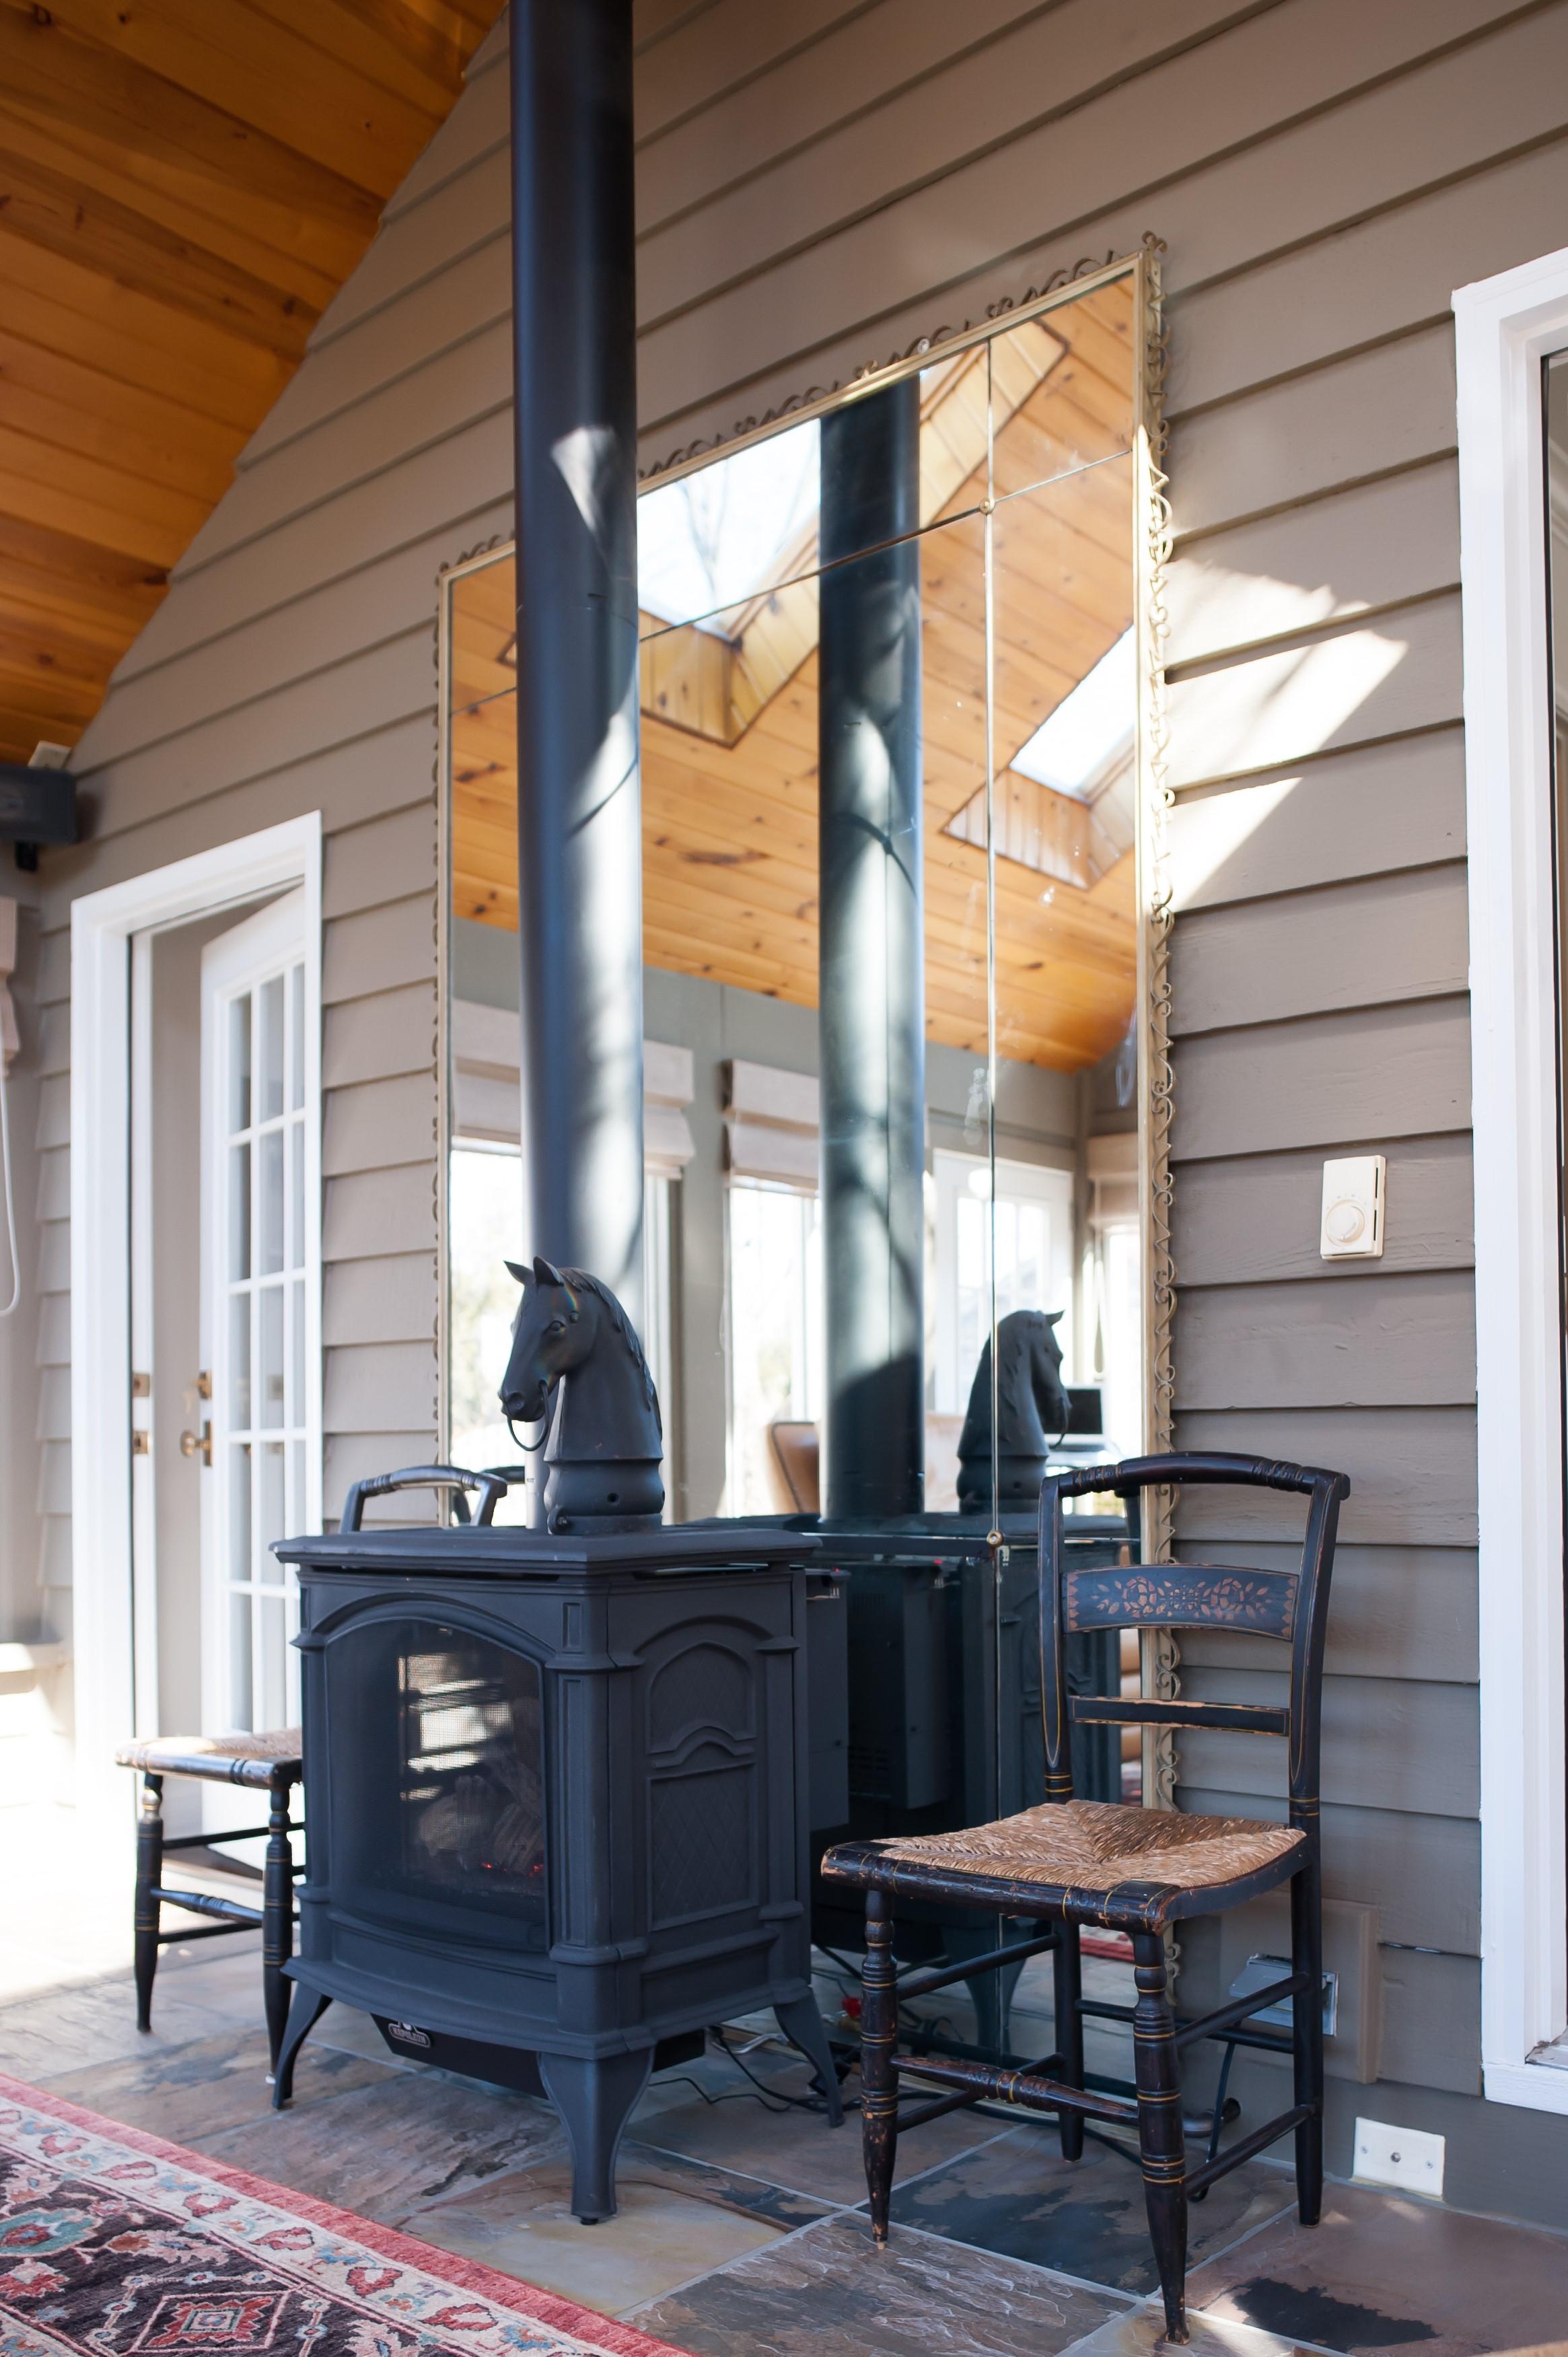 iron stove fireplace.jpg